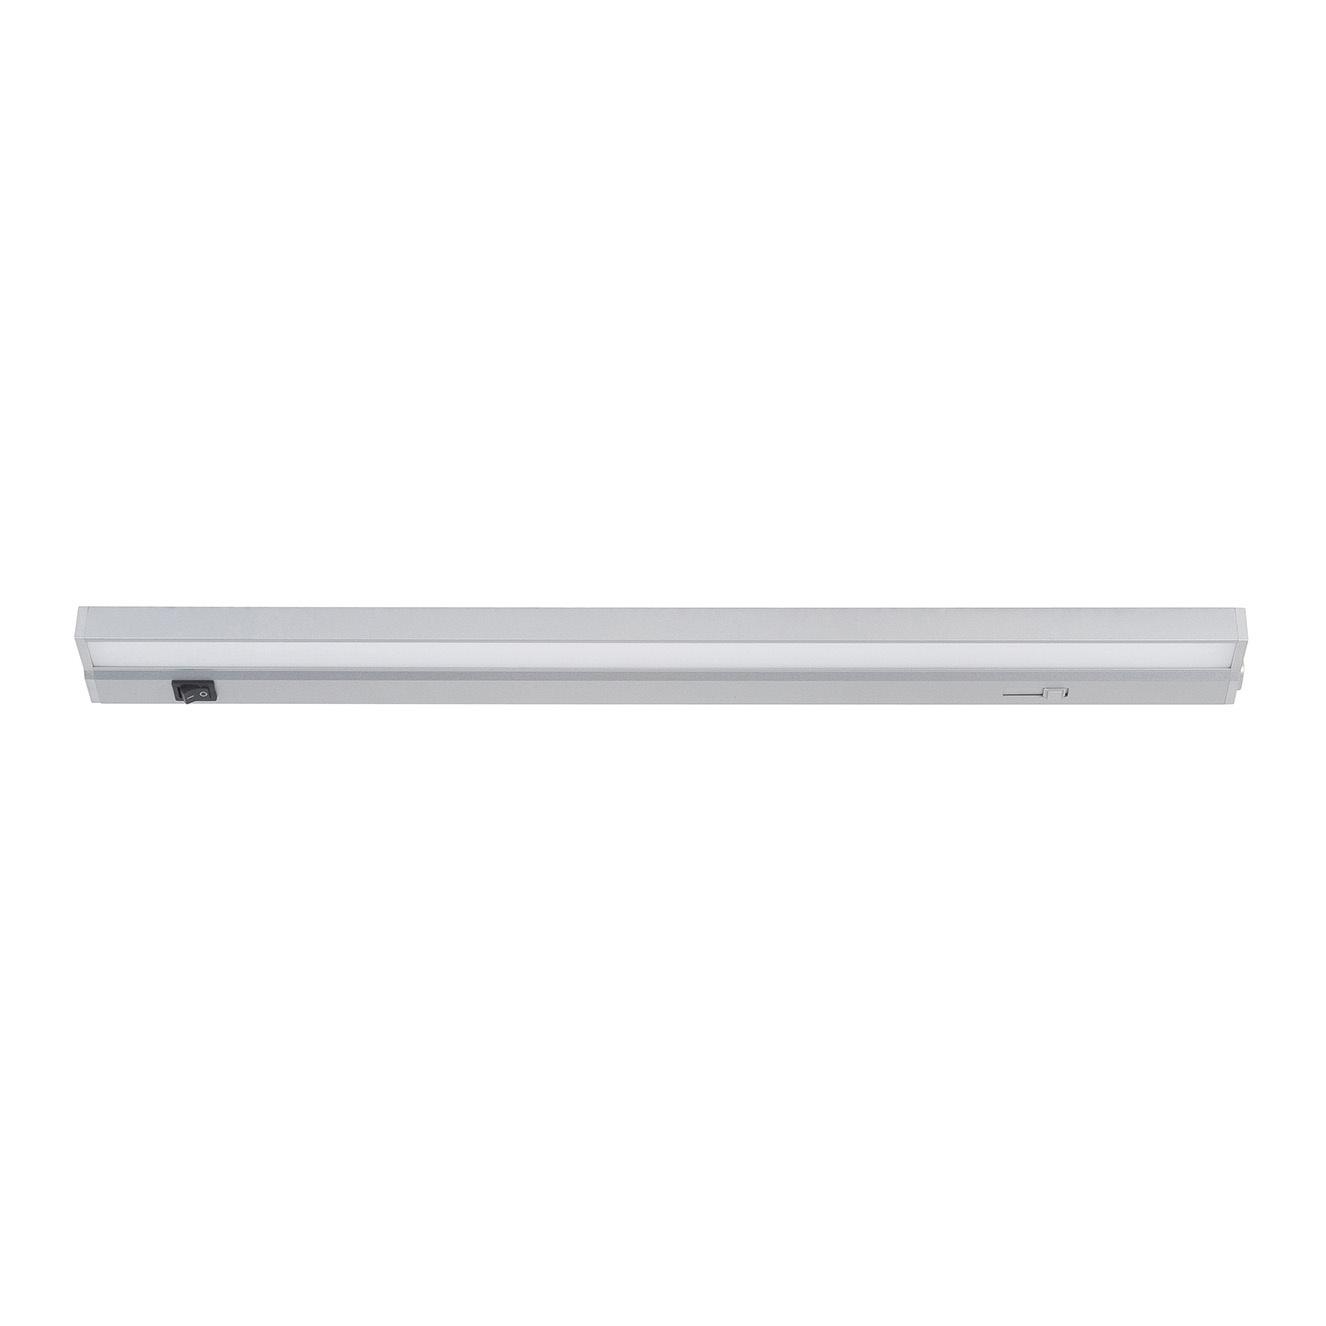 Highlight Kast verlichting LED 58 cm aluminium